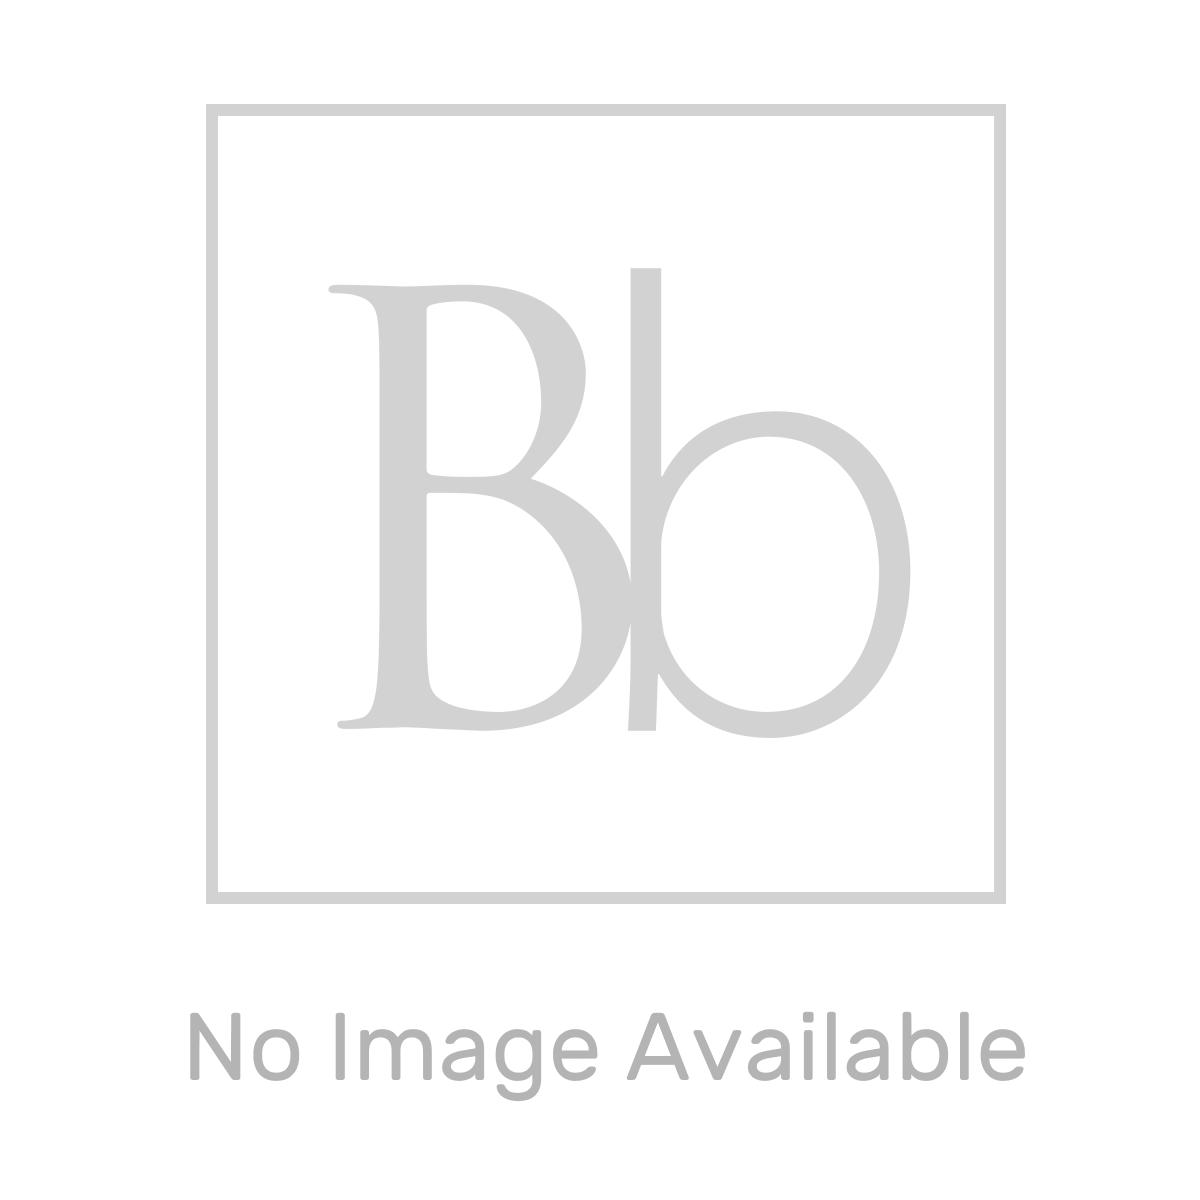 RAK Cloud Gloss Alpine White Wall Hung Toilet with Soft Close Seat